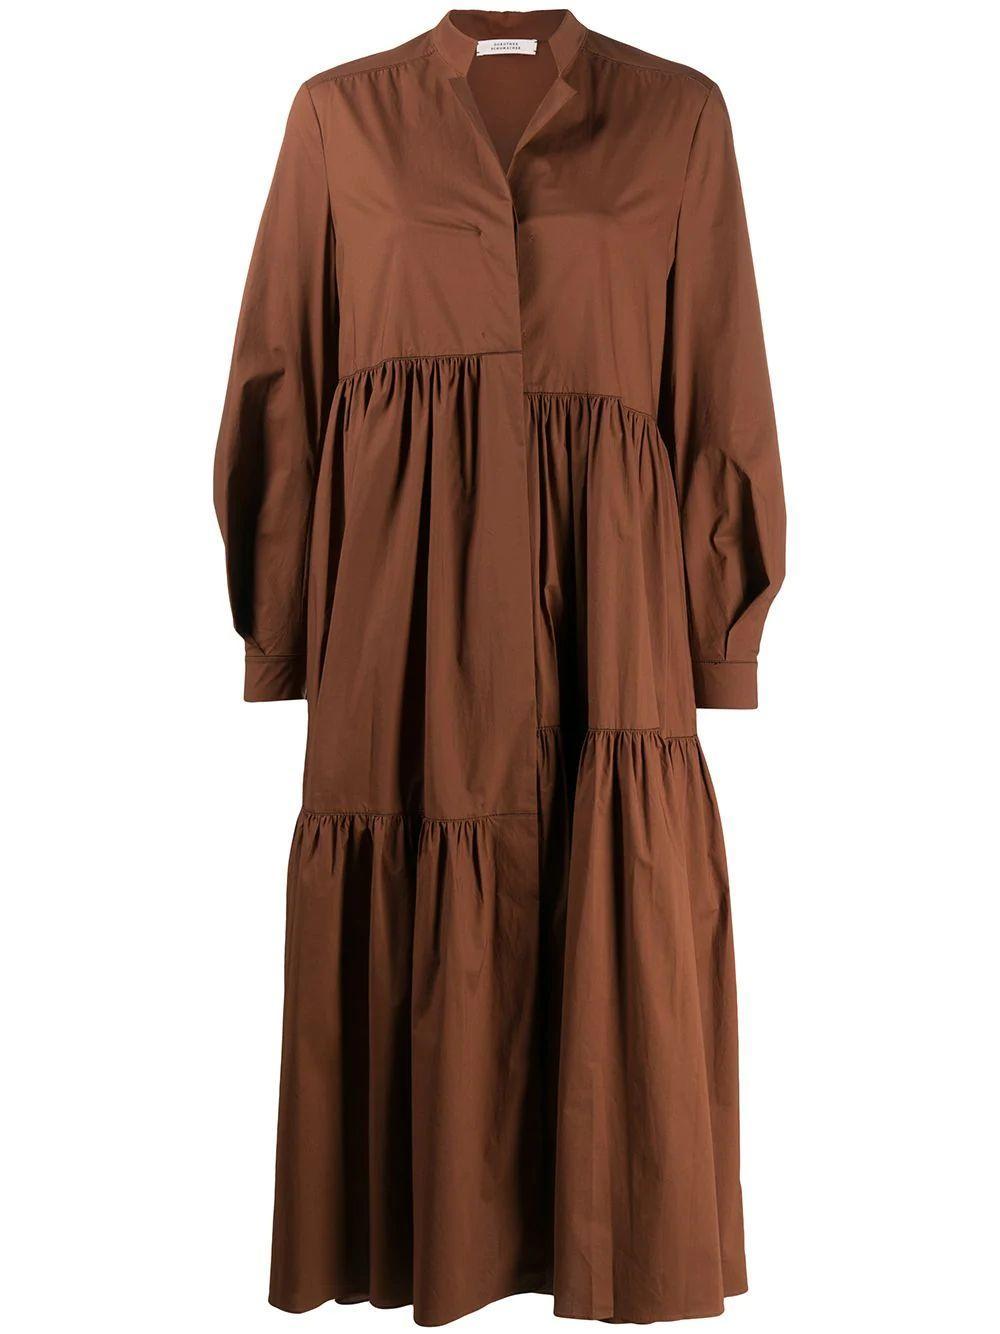 Poplin Power Long Sleeve Midi Dress Item # 748201-S20